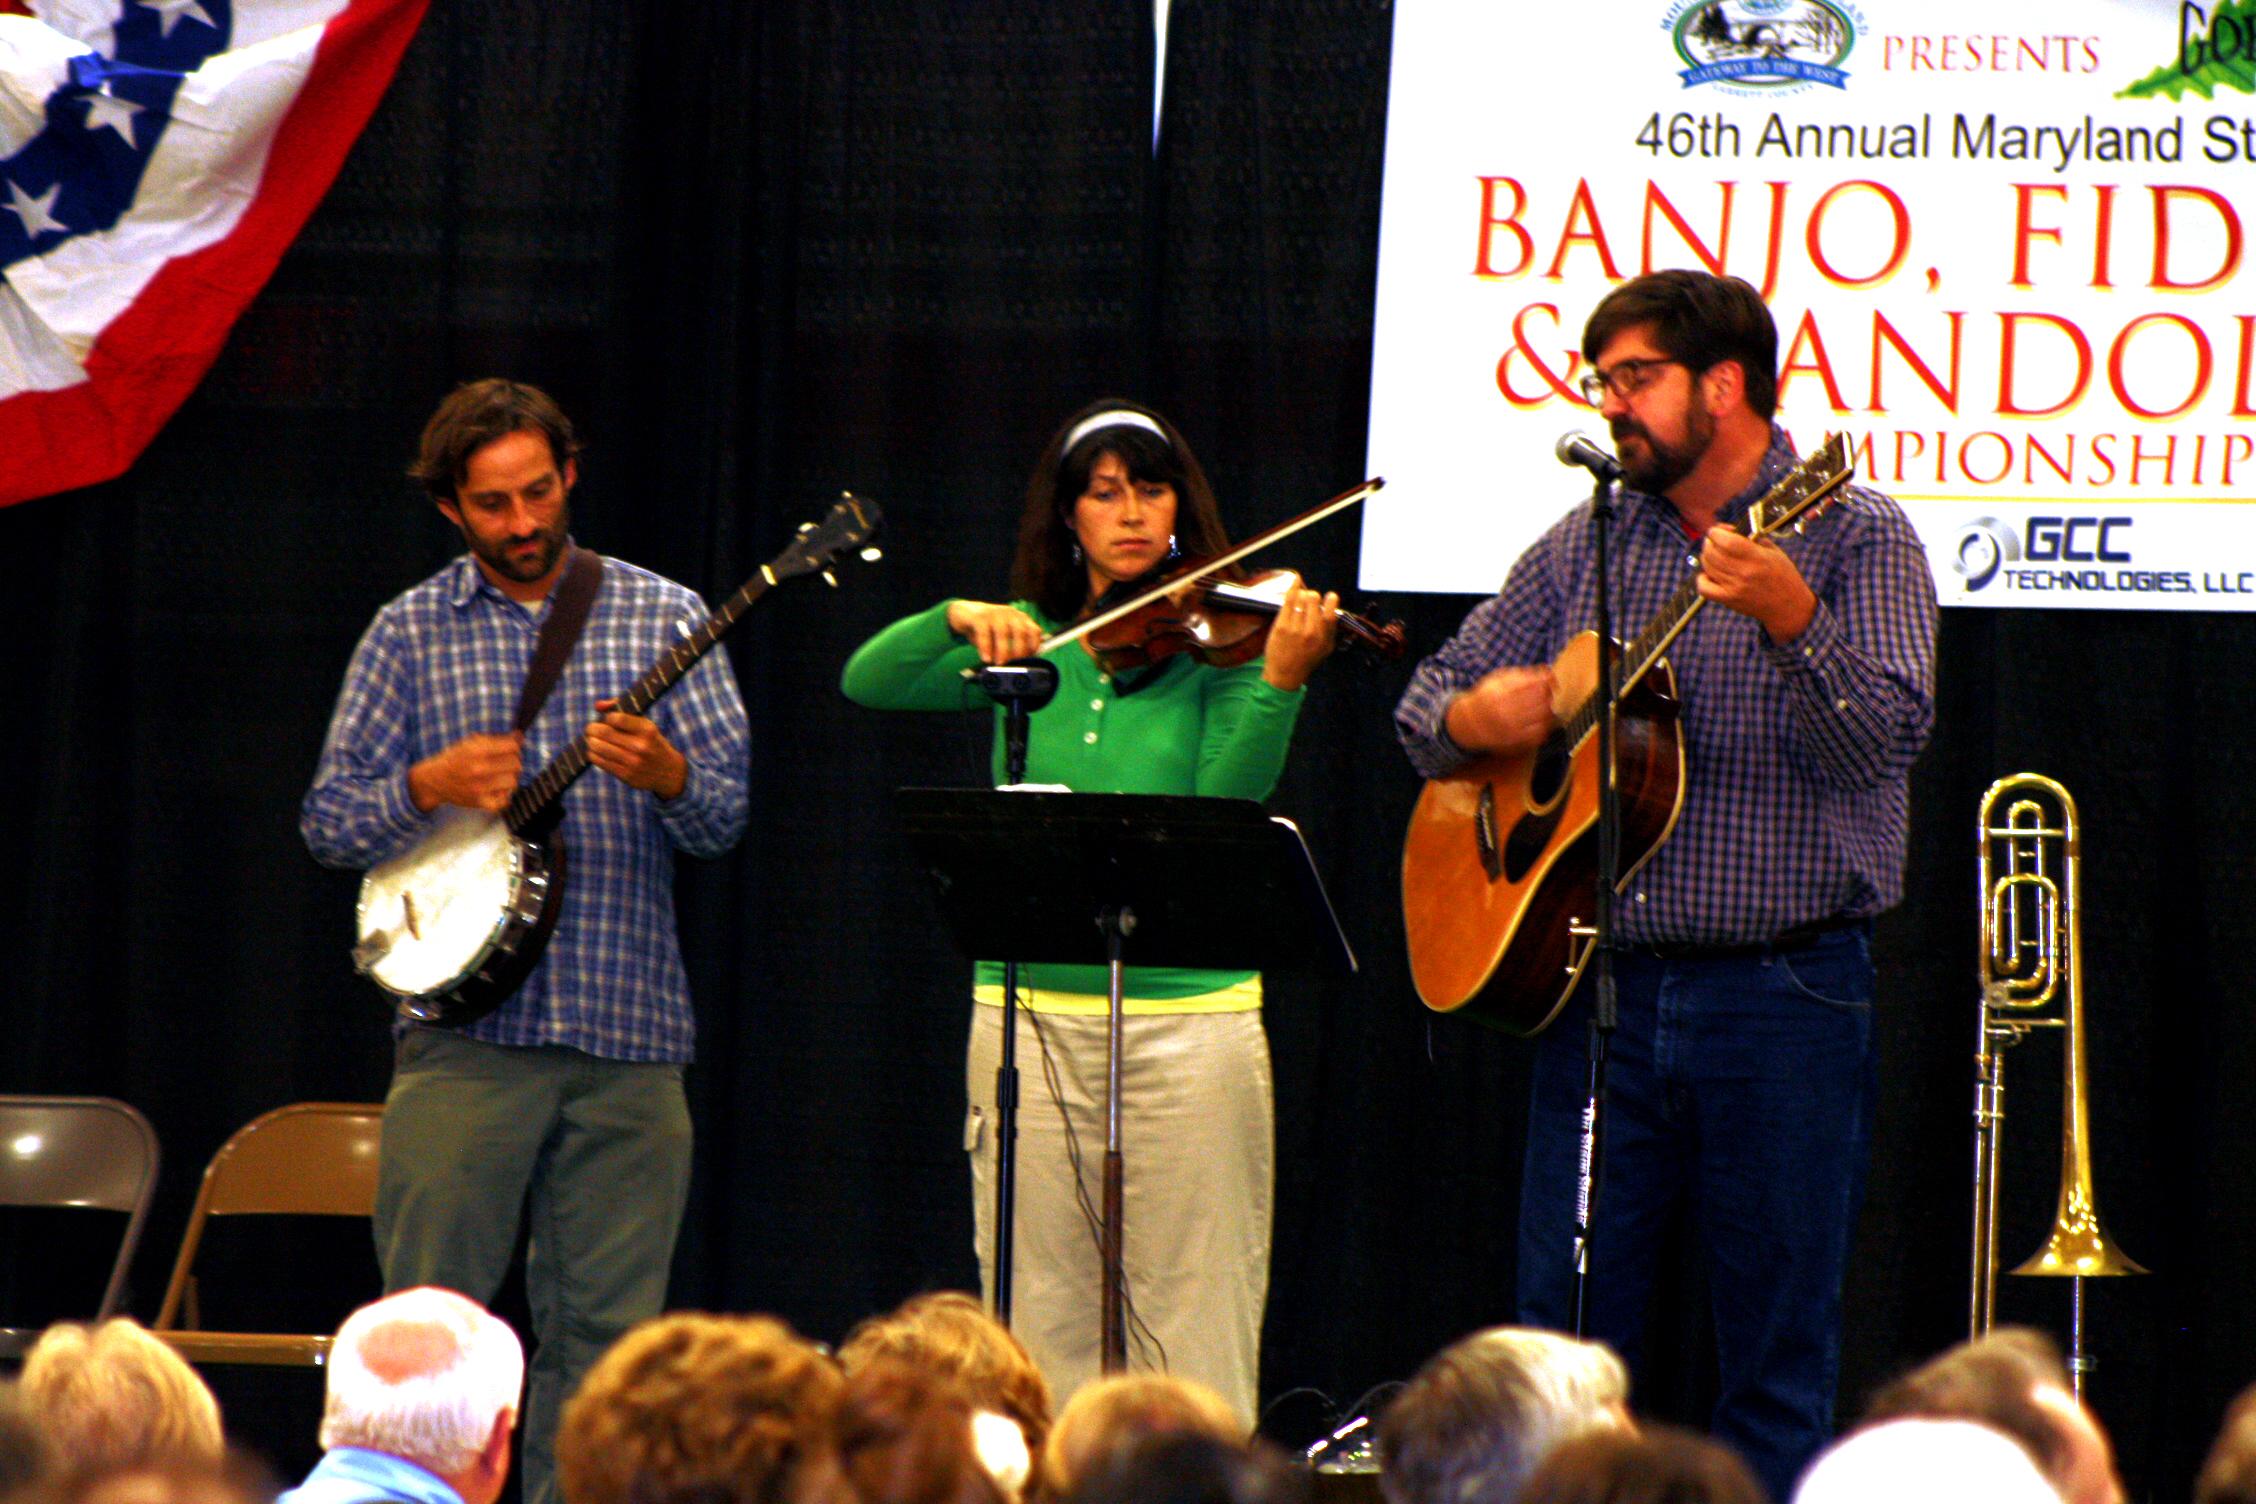 Maryland State Banjo & Mandolin Championship